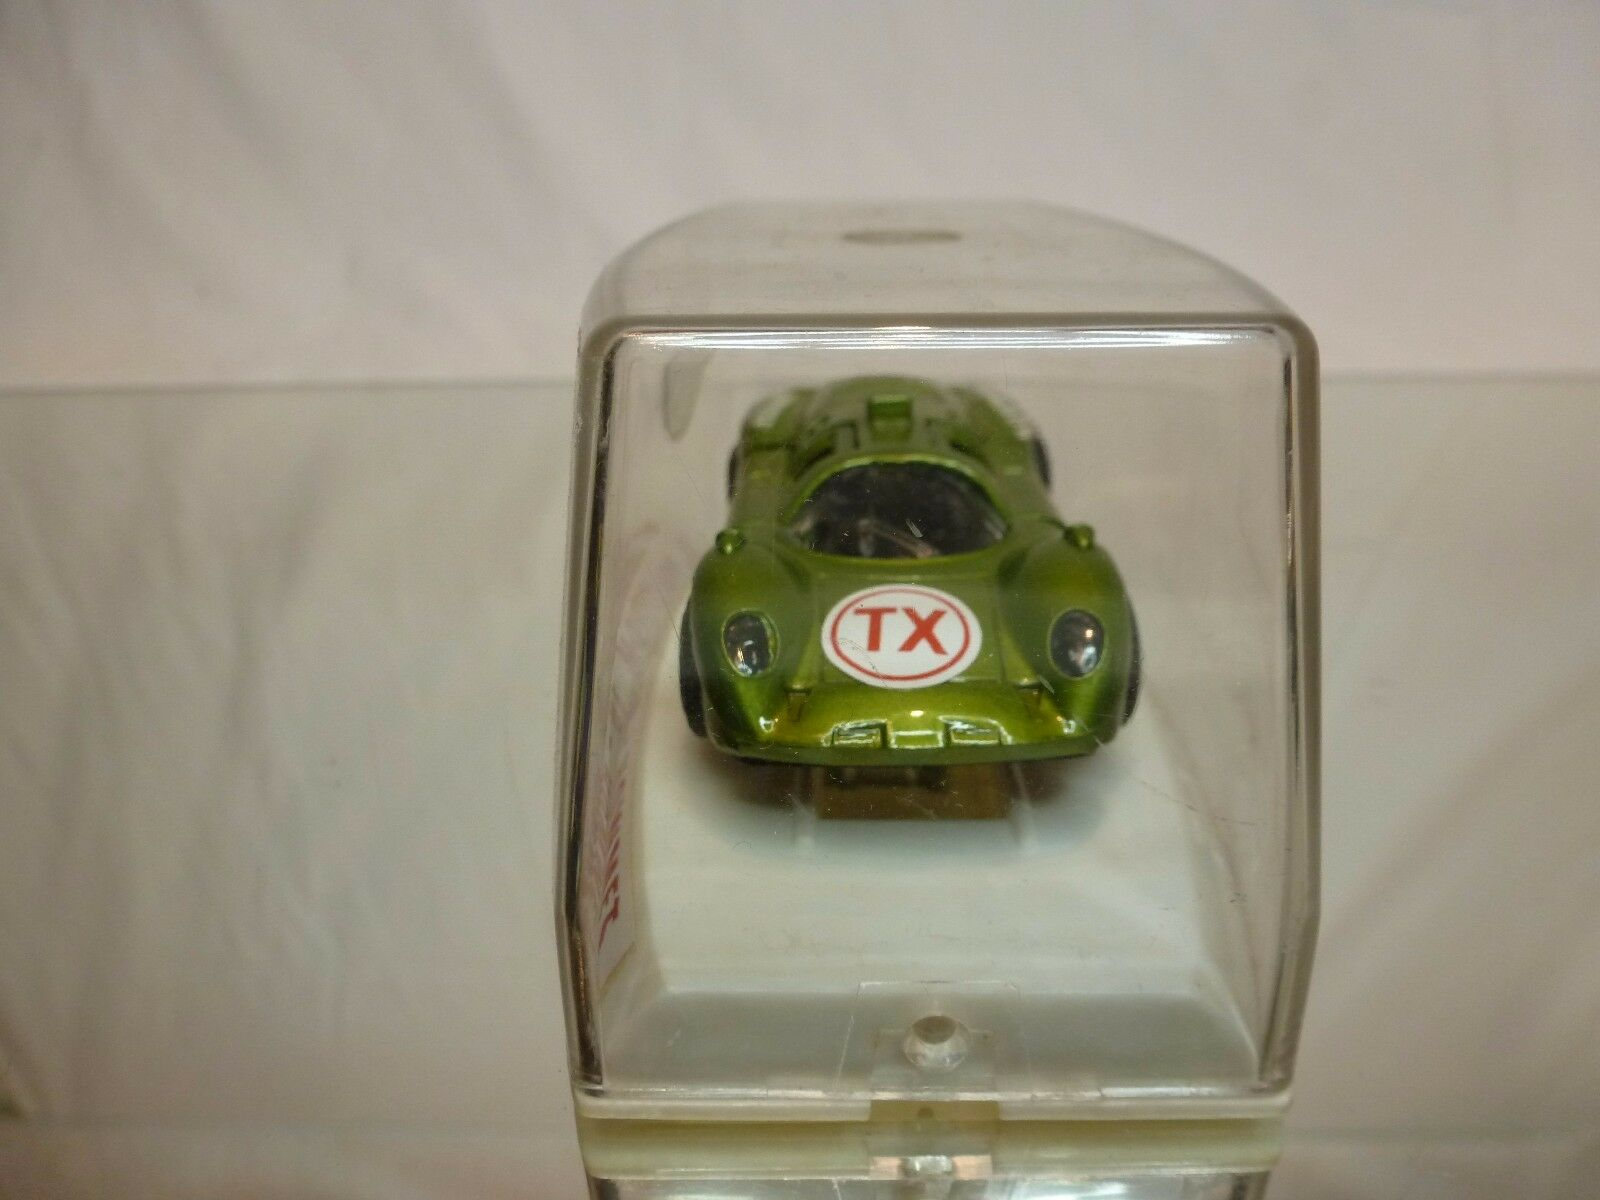 POLITOYS M10 HOWMET HOWMET HOWMET TX TURBINA - GREEN METALLIC 1 43 - VERY GOOD IN BOX 95435e